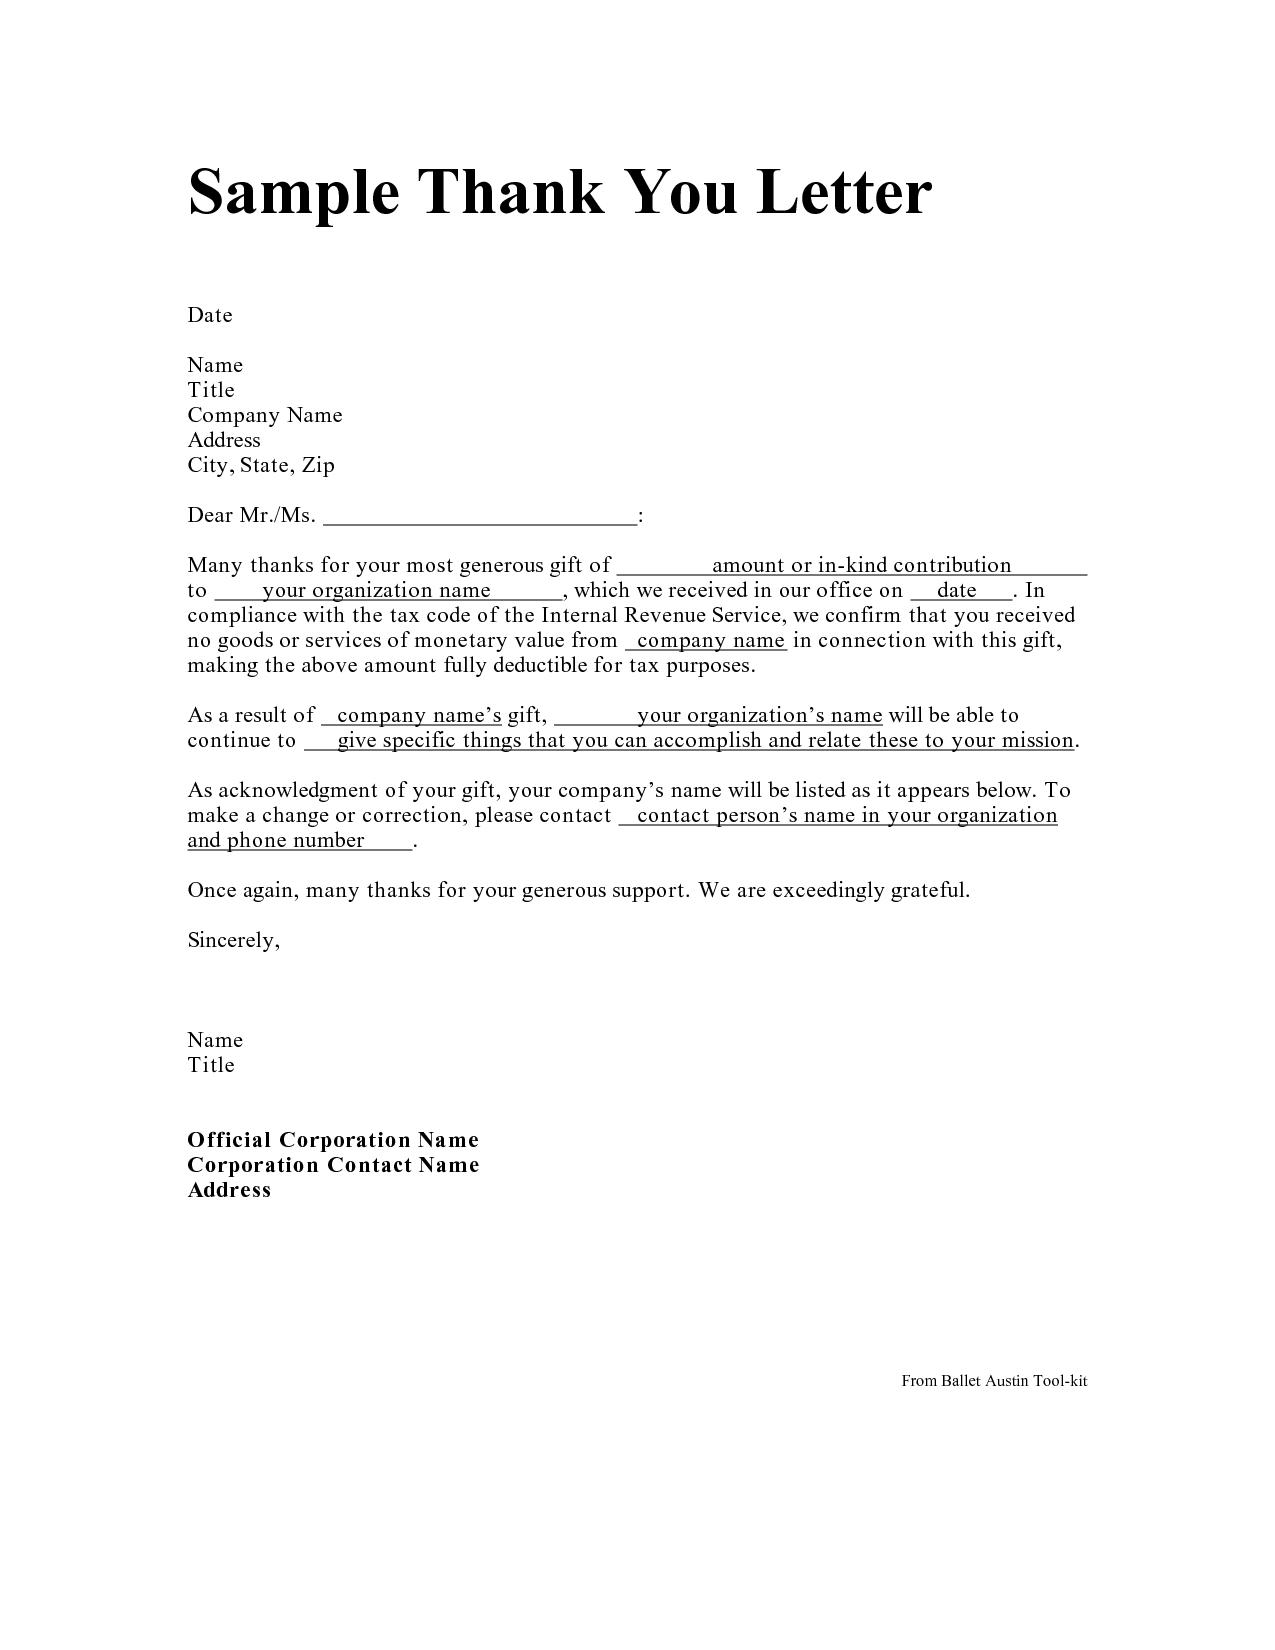 Formal thank you letter format sample formal letter format to judge letters example spiritdancerdesigns Images